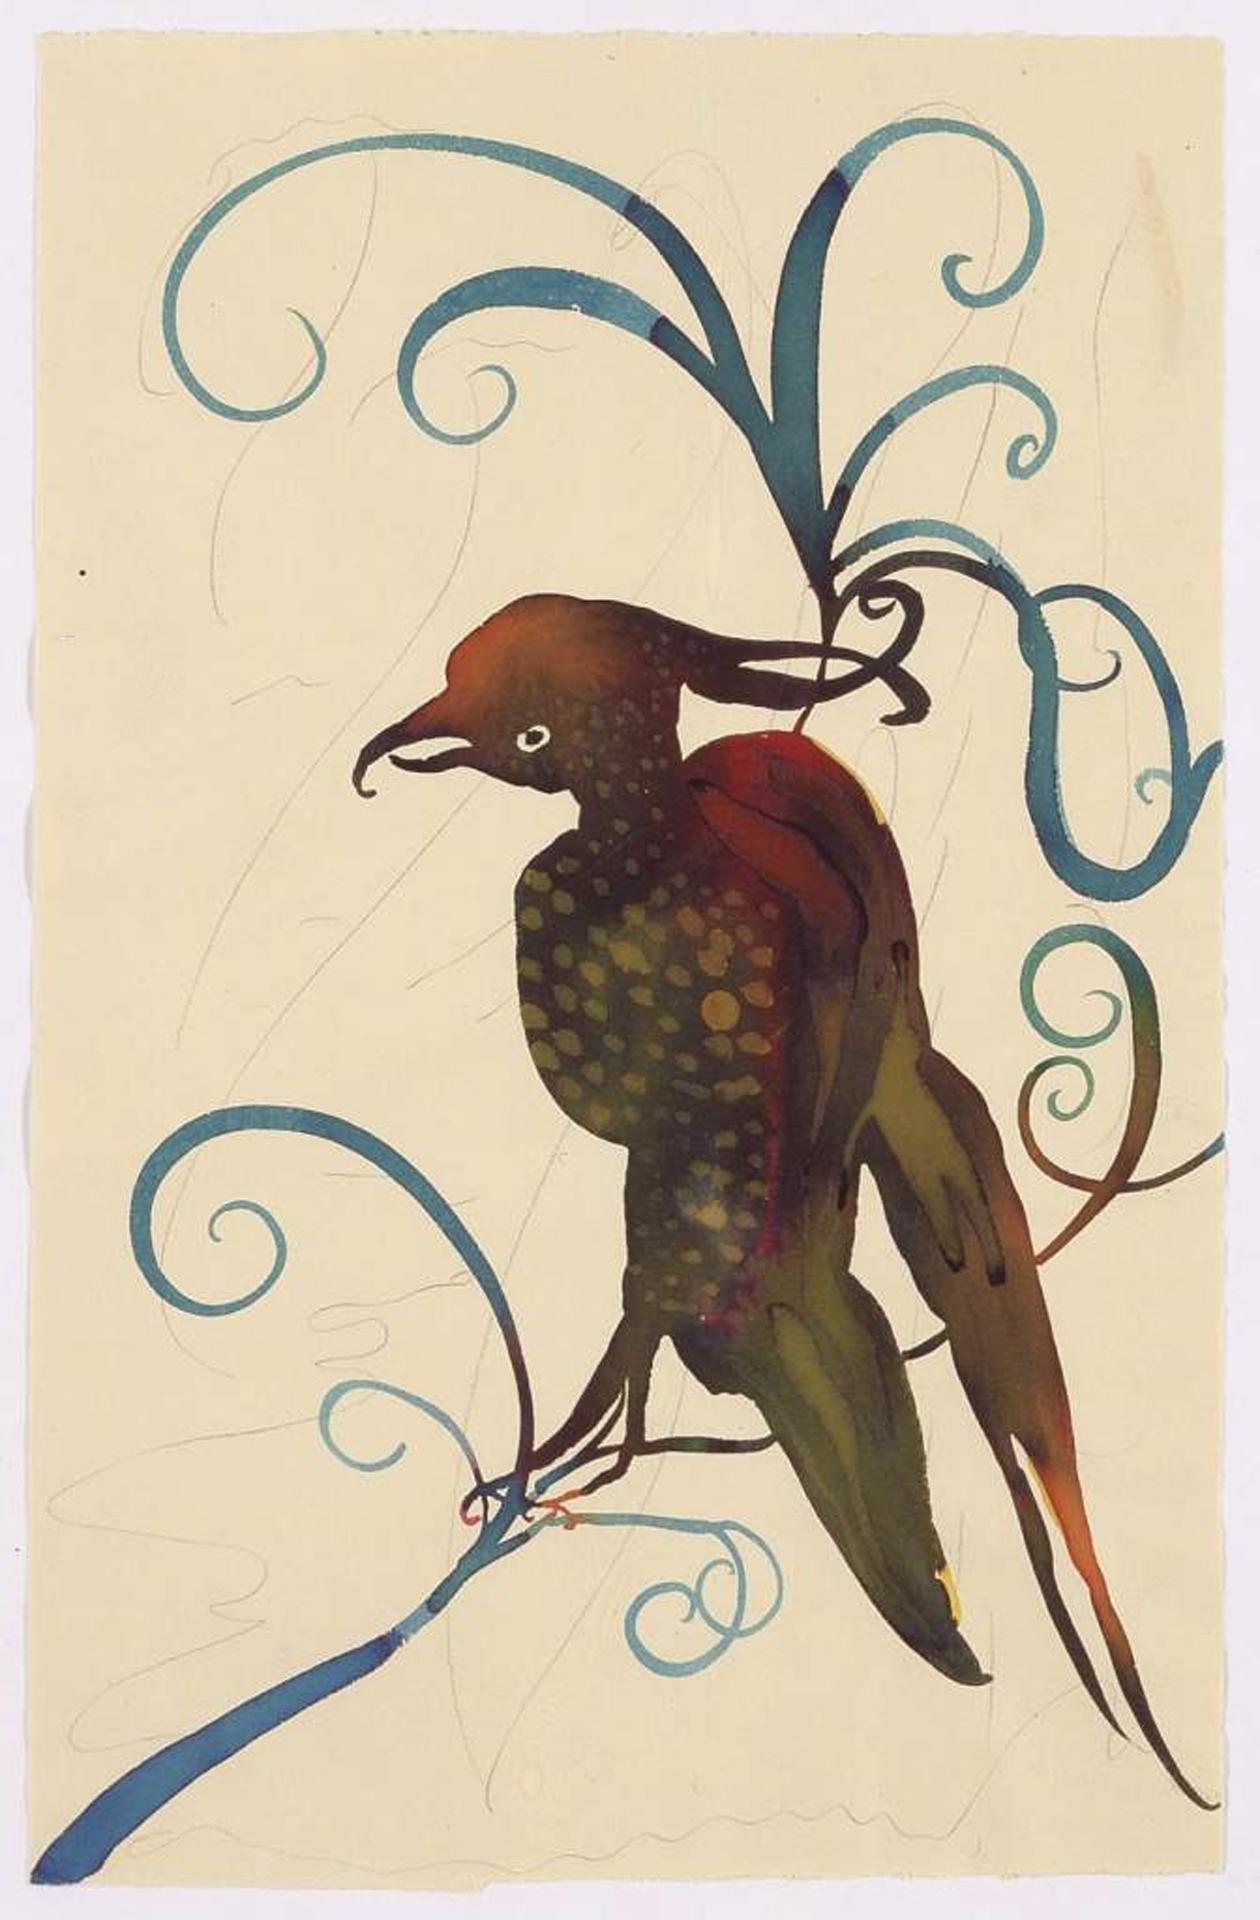 Chris Ofili, Ohne Titel (Bird red and yellow), 2004, Aquarell und Bleistift auf Papier, 32,5 x 21 cm